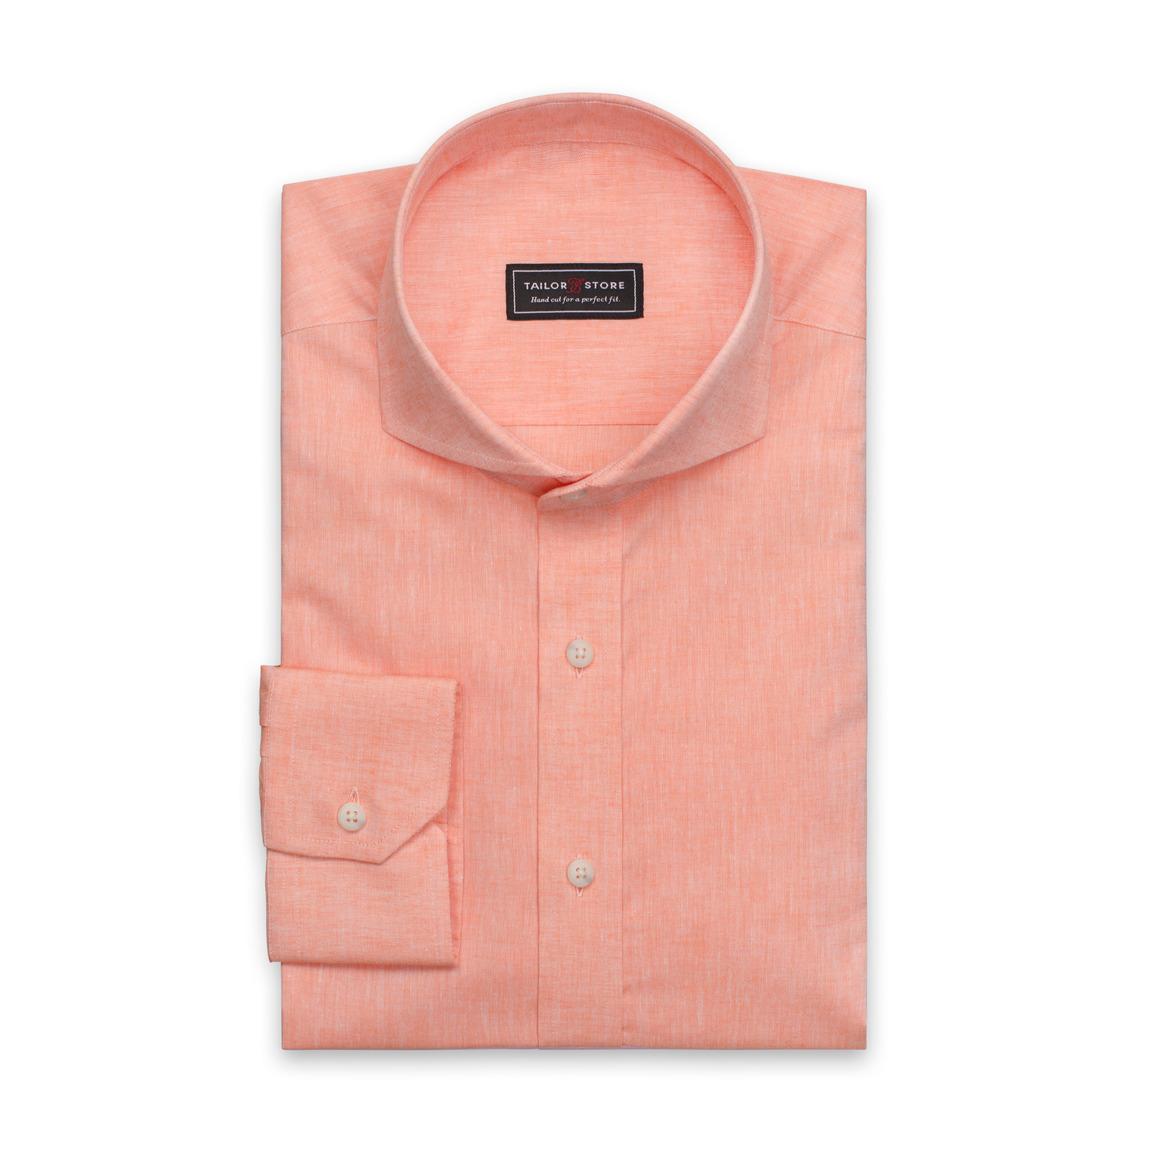 Orange cotton/linen shirt